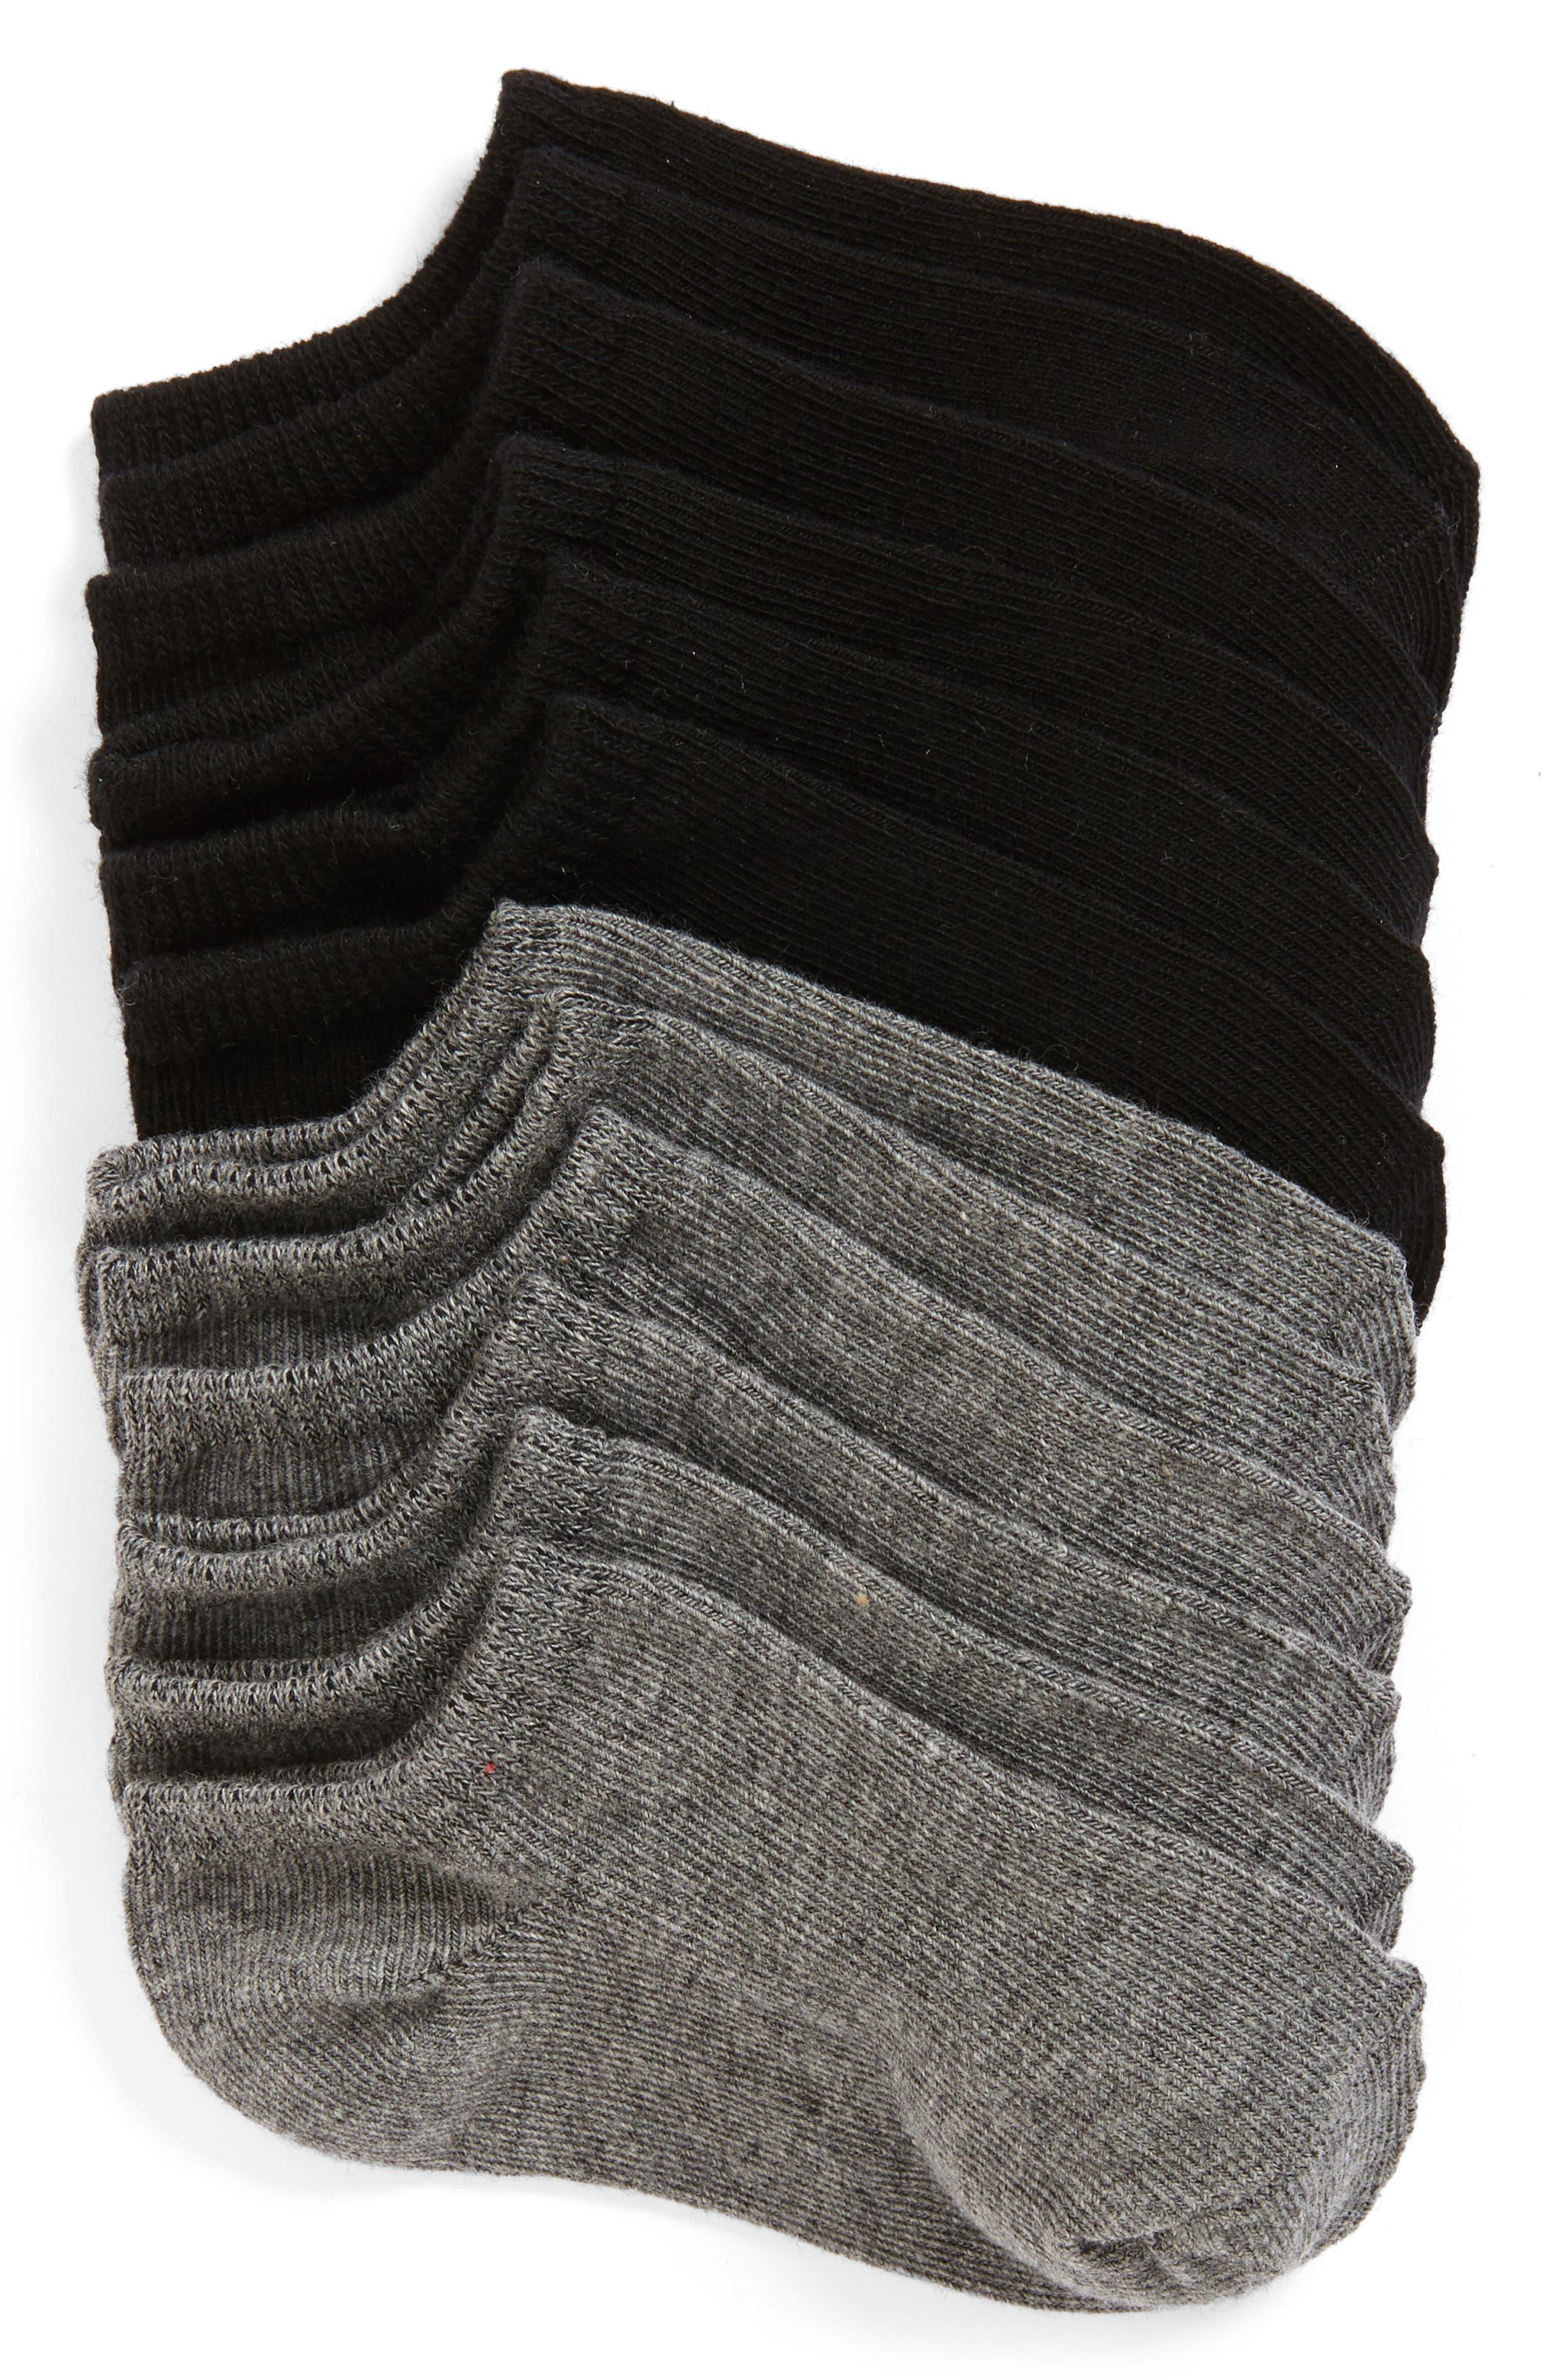 TUCKER + TATE,                             6-Pack Low Cut Socks,                             Main thumbnail 1, color,                             MULTI